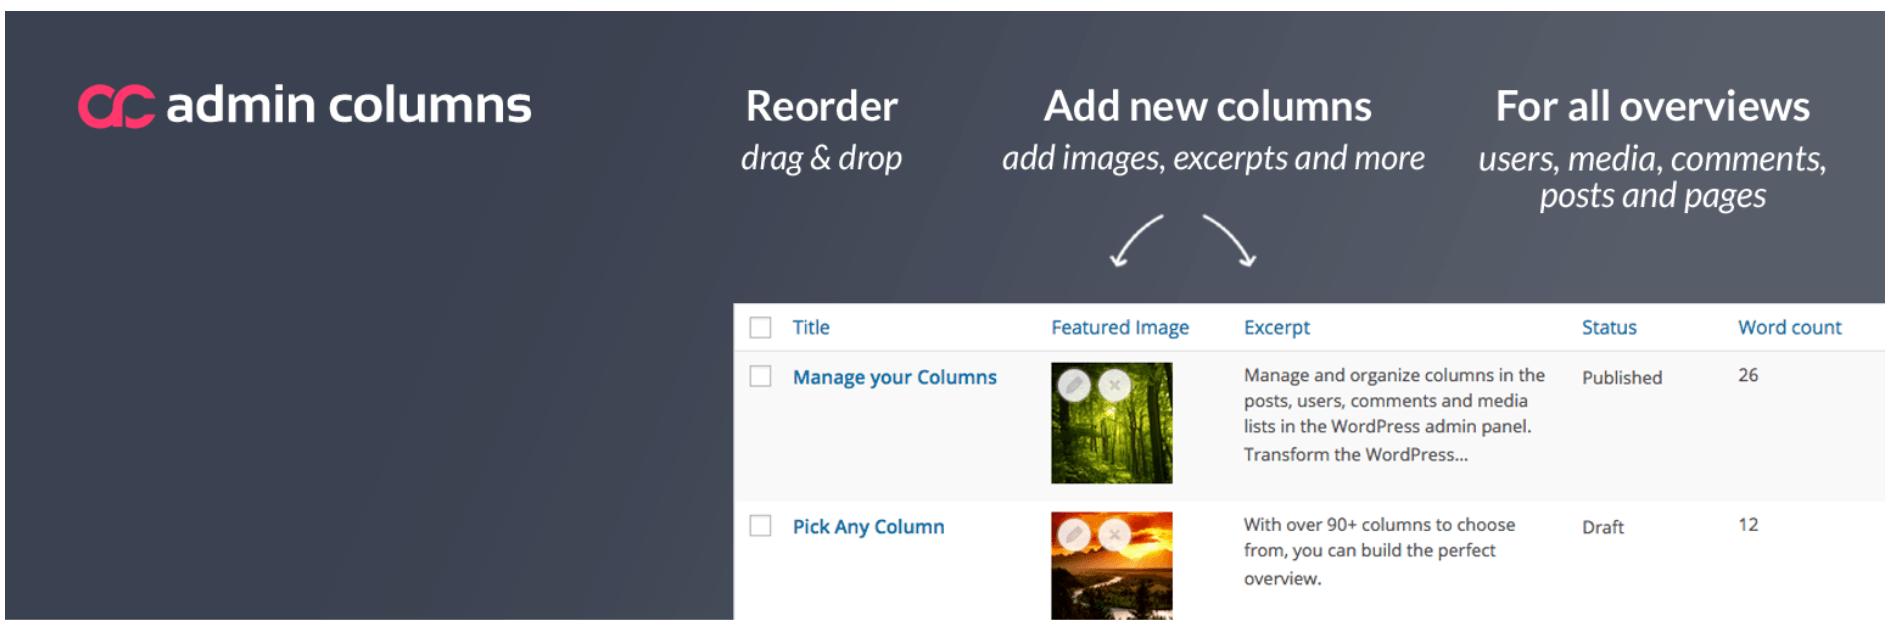 How to Create Columns in WordPress